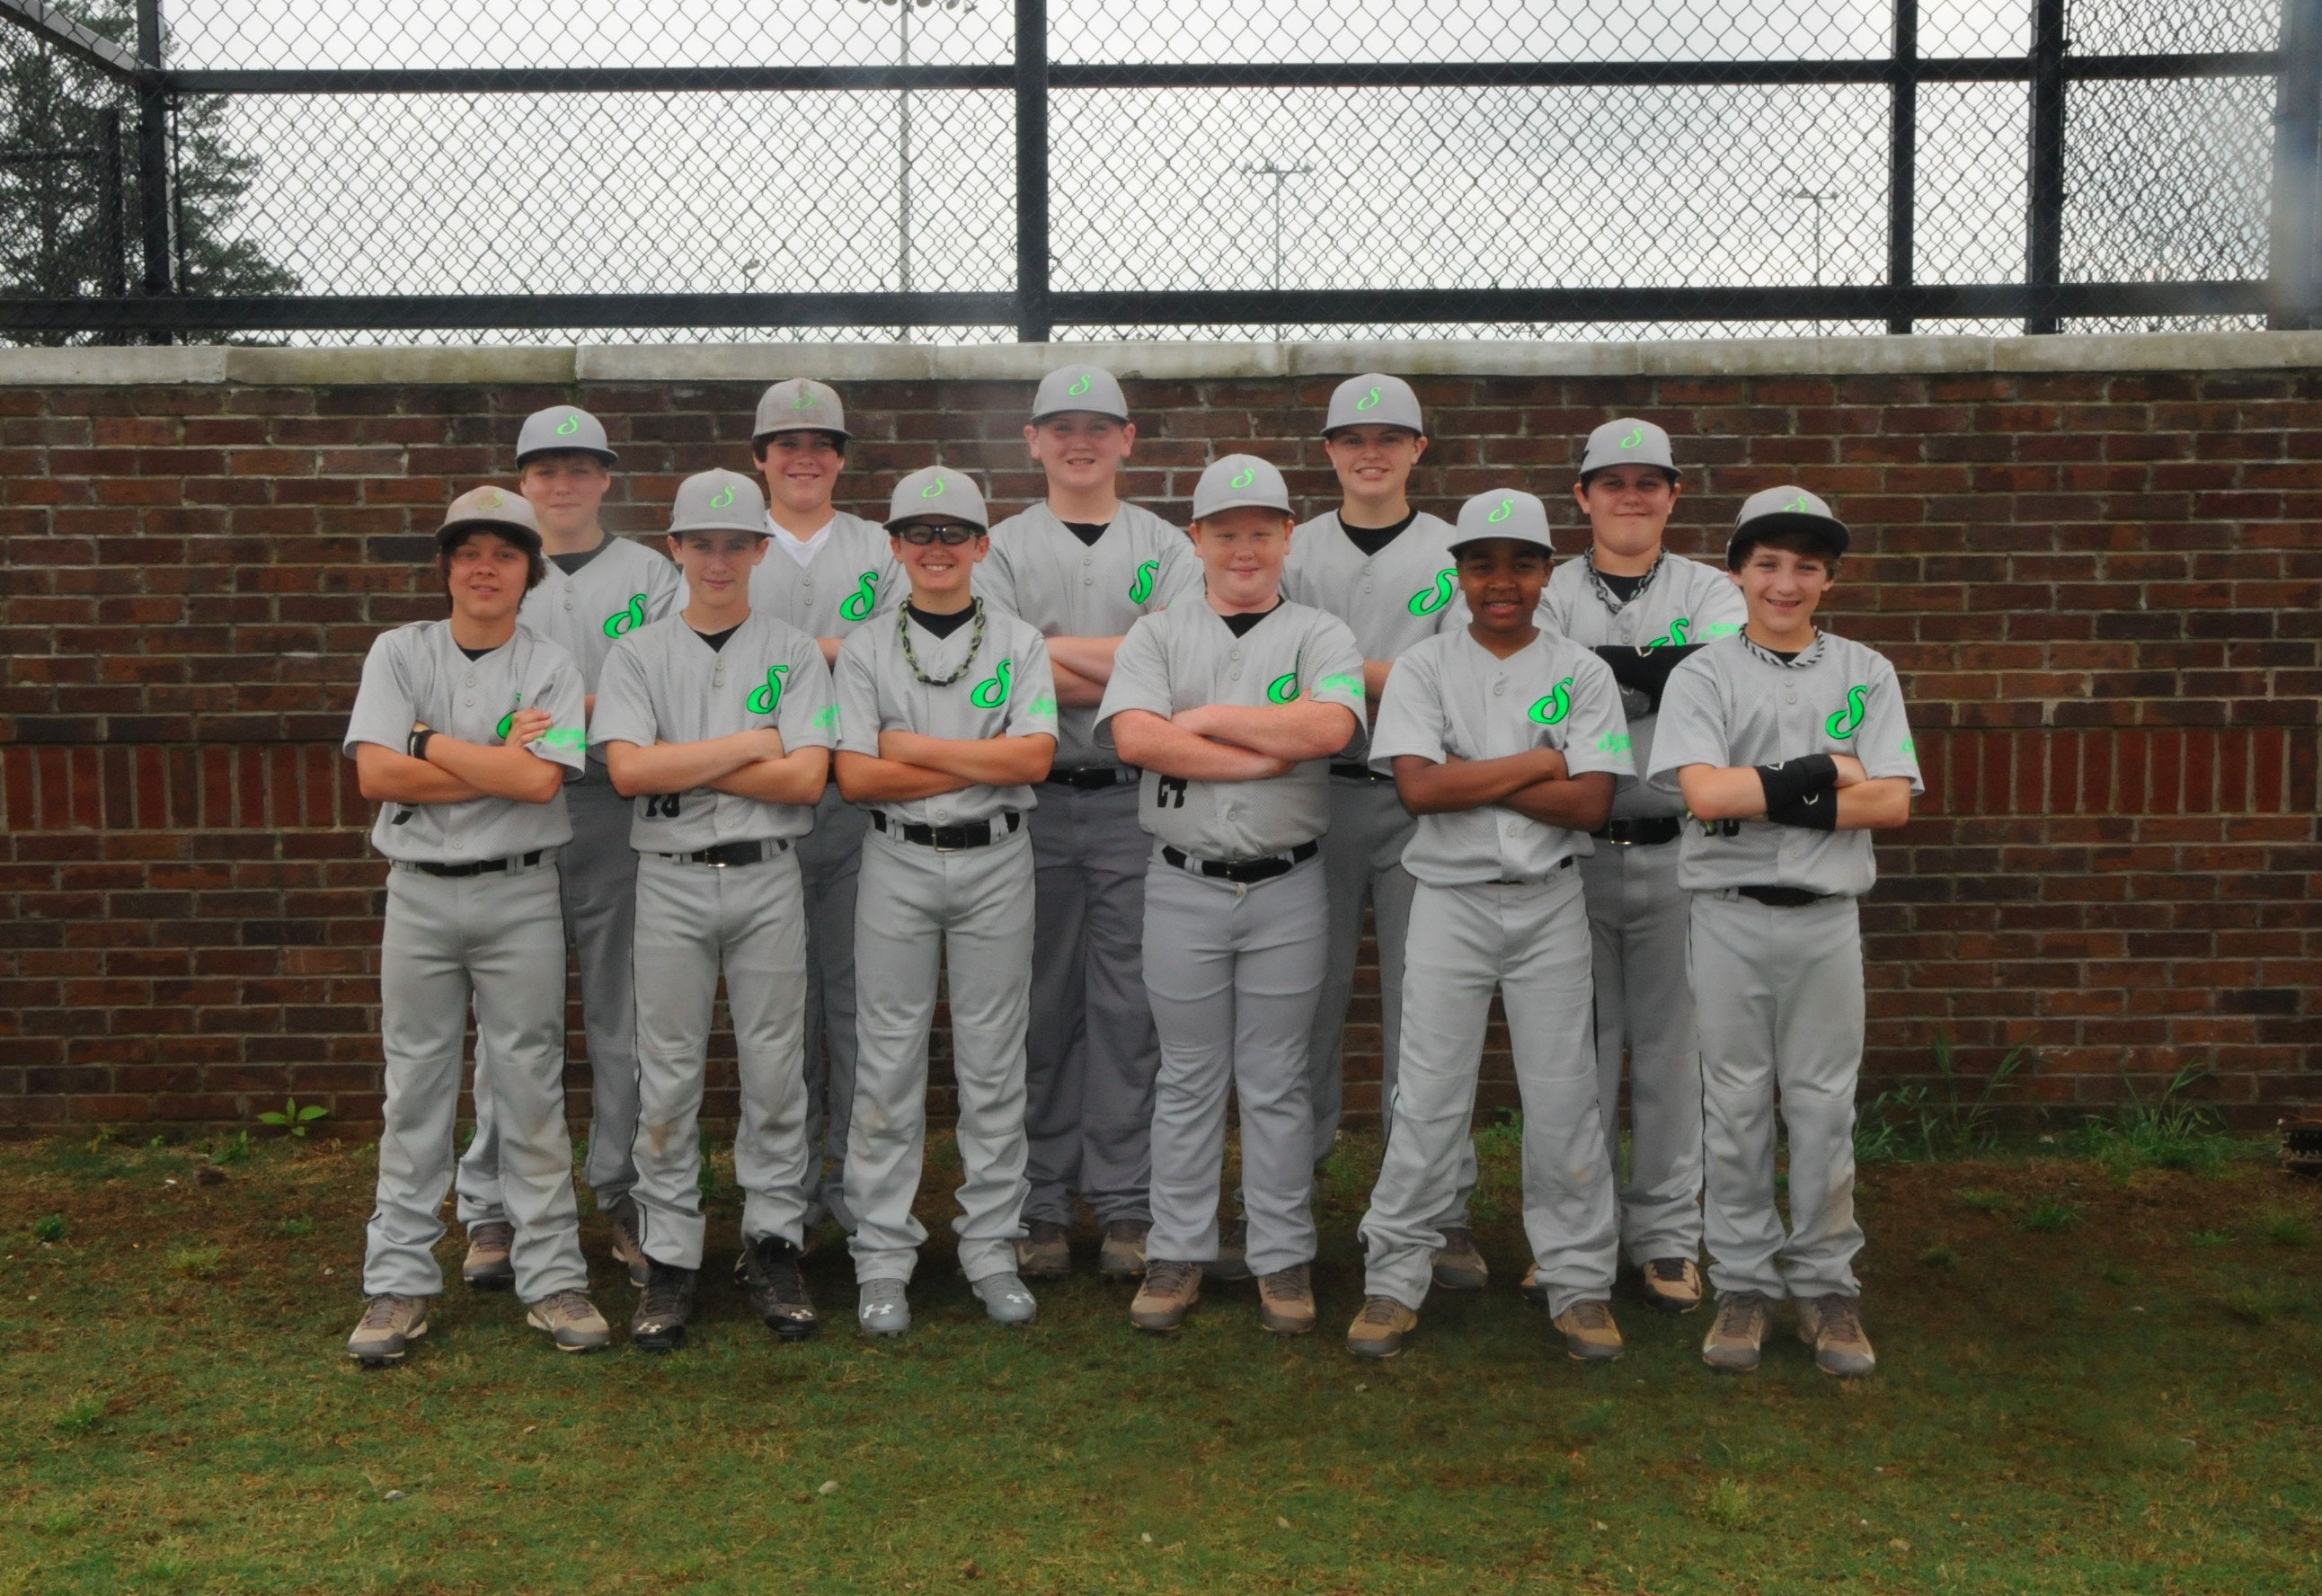 Kevin Scarbinsky's Hot Corner Scorpions 12U Baseball Team